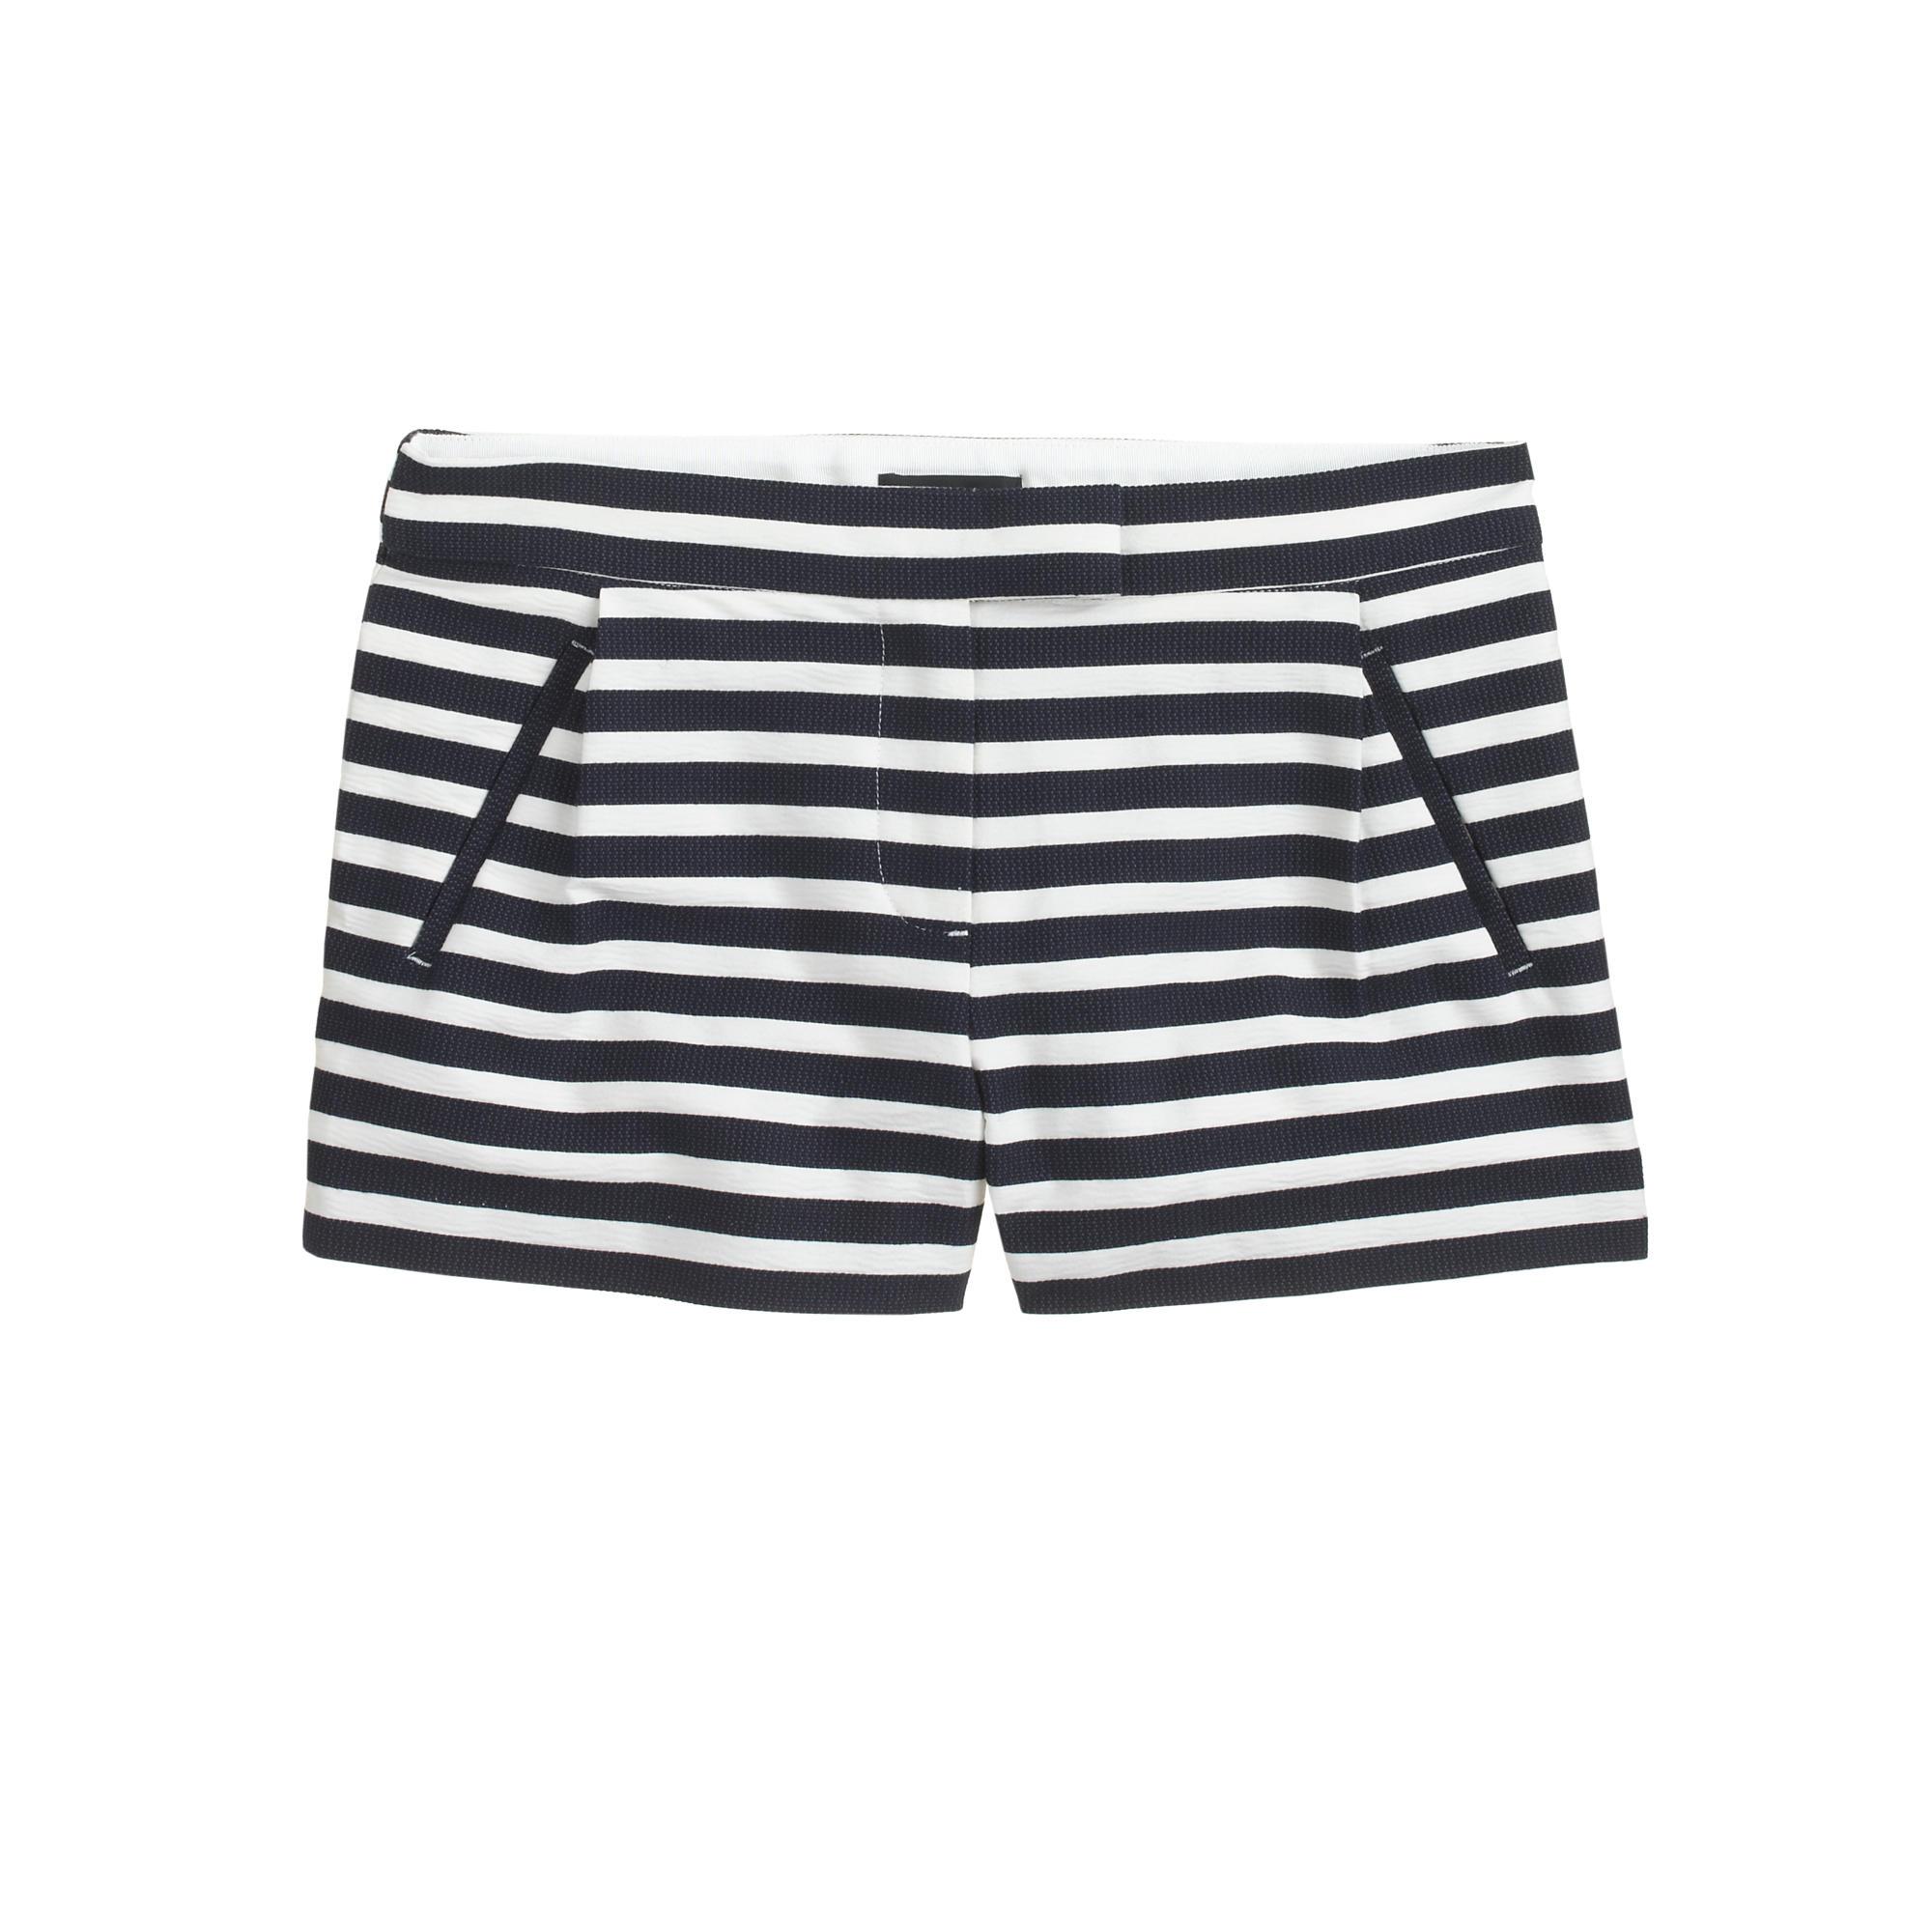 Textured stripe short in navy : Women novelty   J.Crew